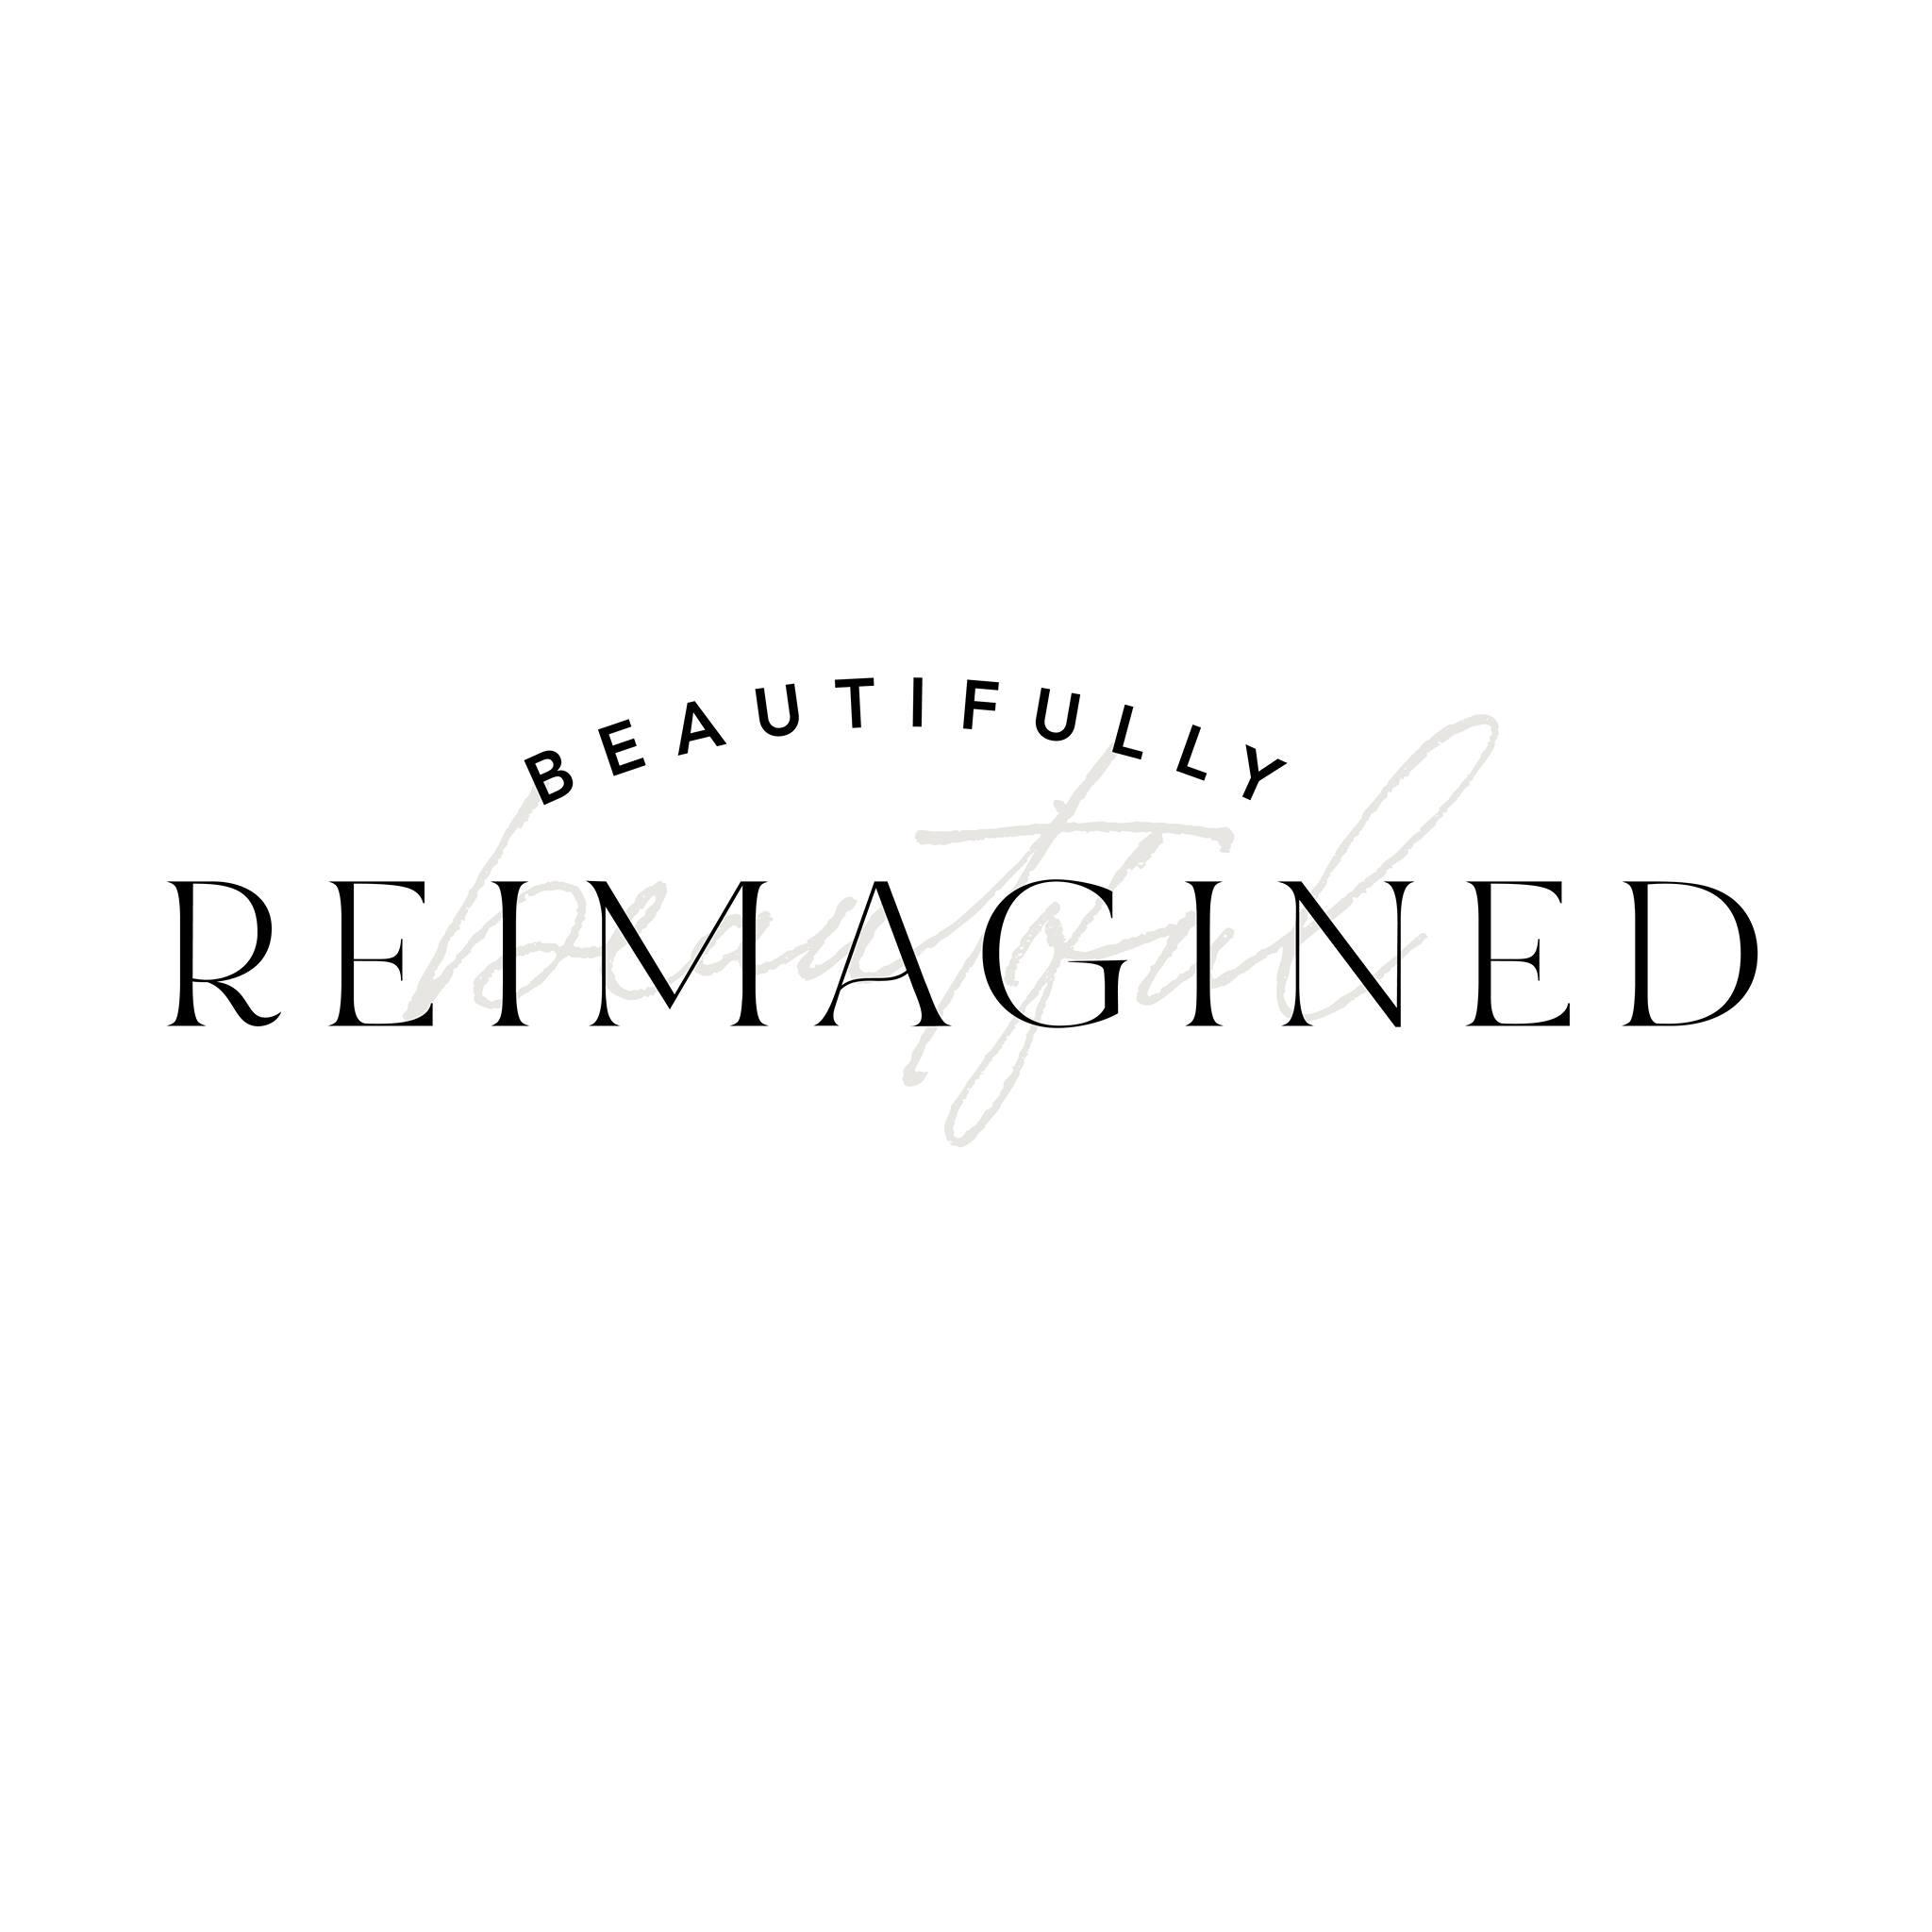 Beautifully Reimagined